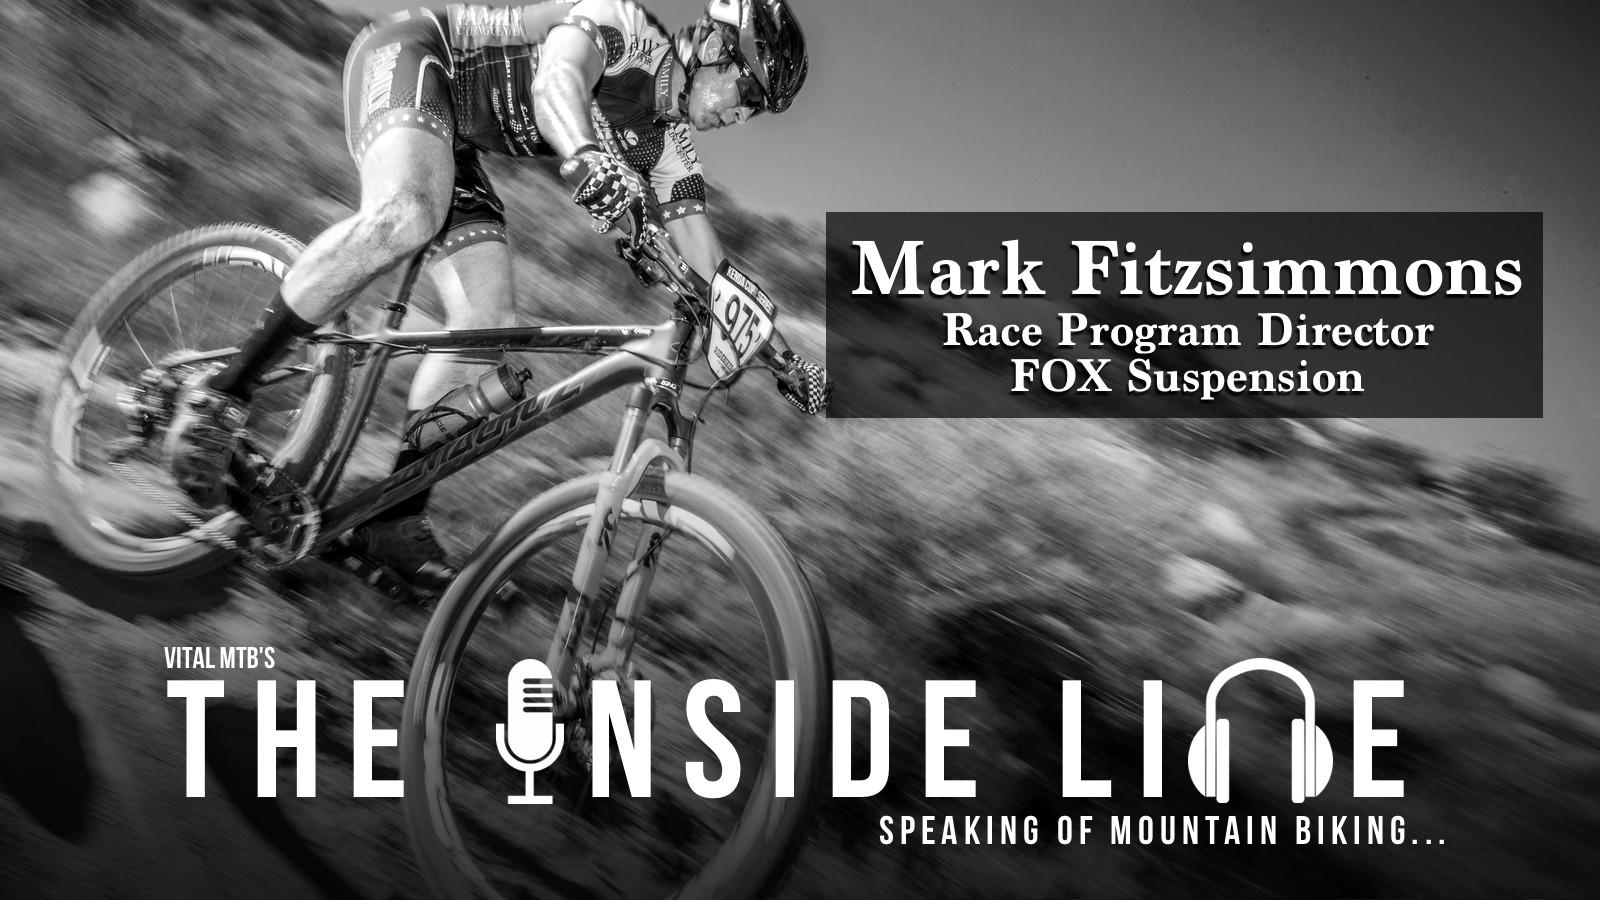 The Inside Line Podcast - Mark Fitzsimmons, Race Program Director at FOX